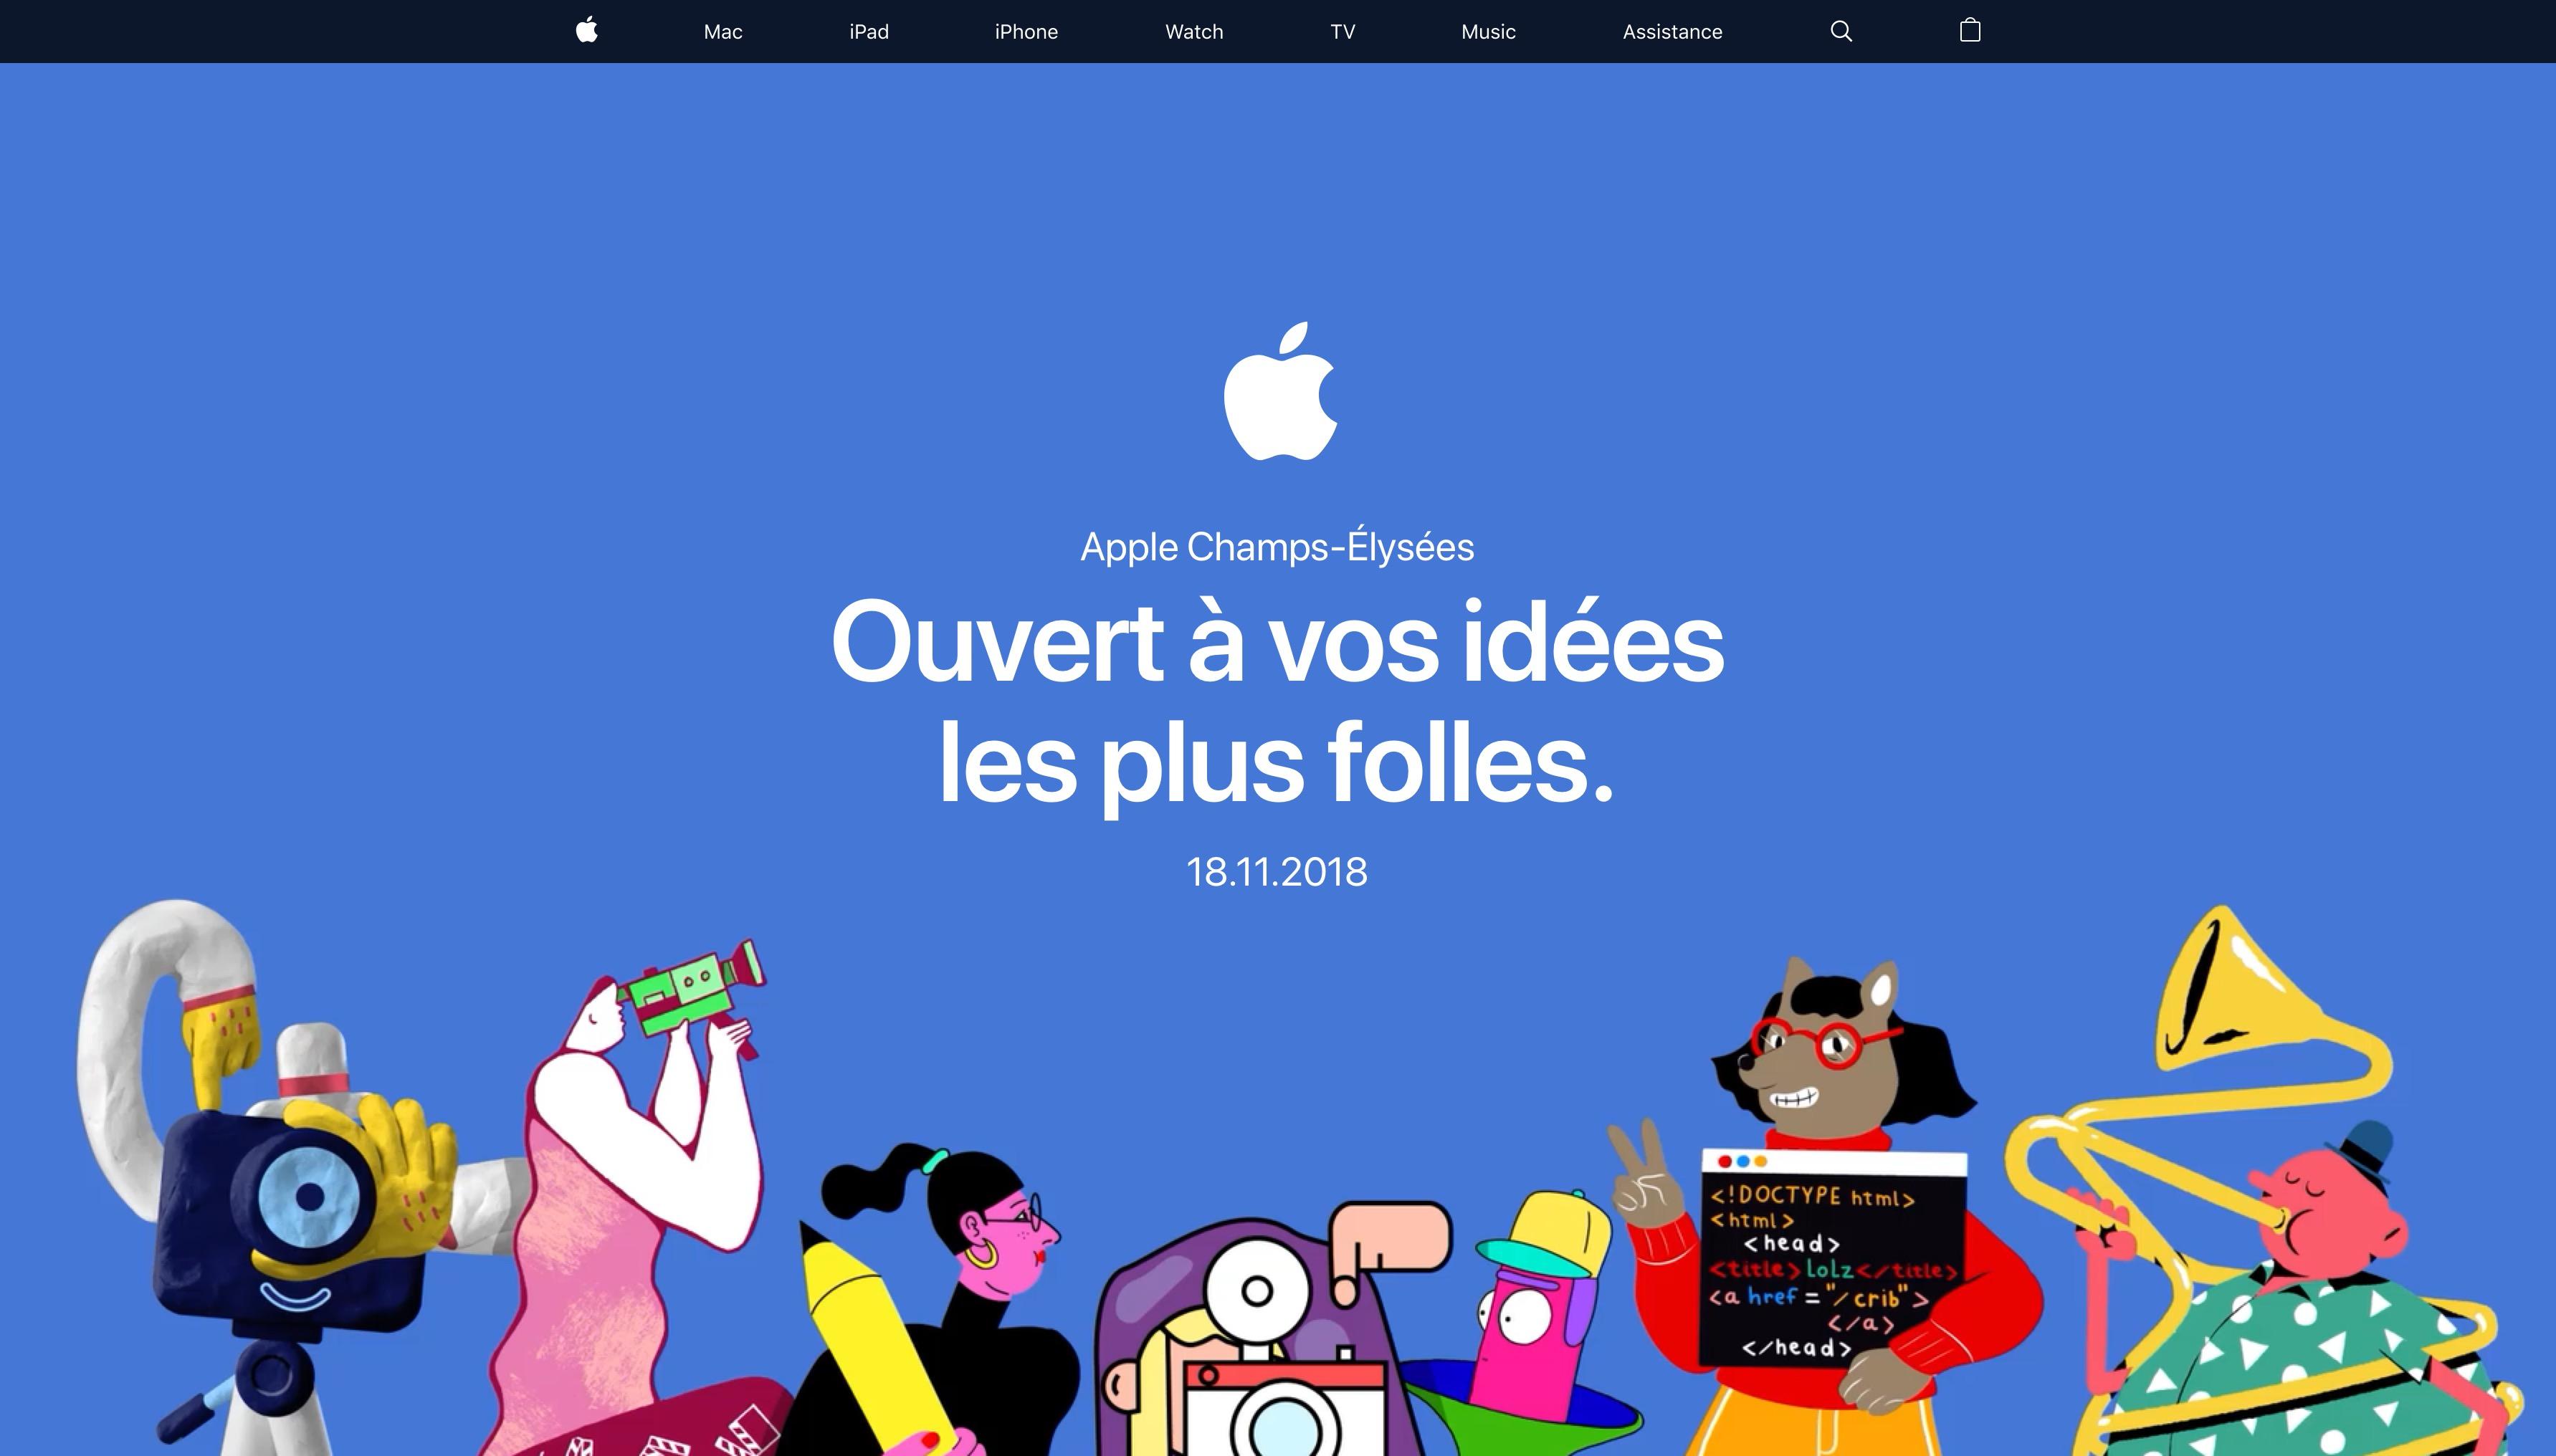 Apple Champs Élysées